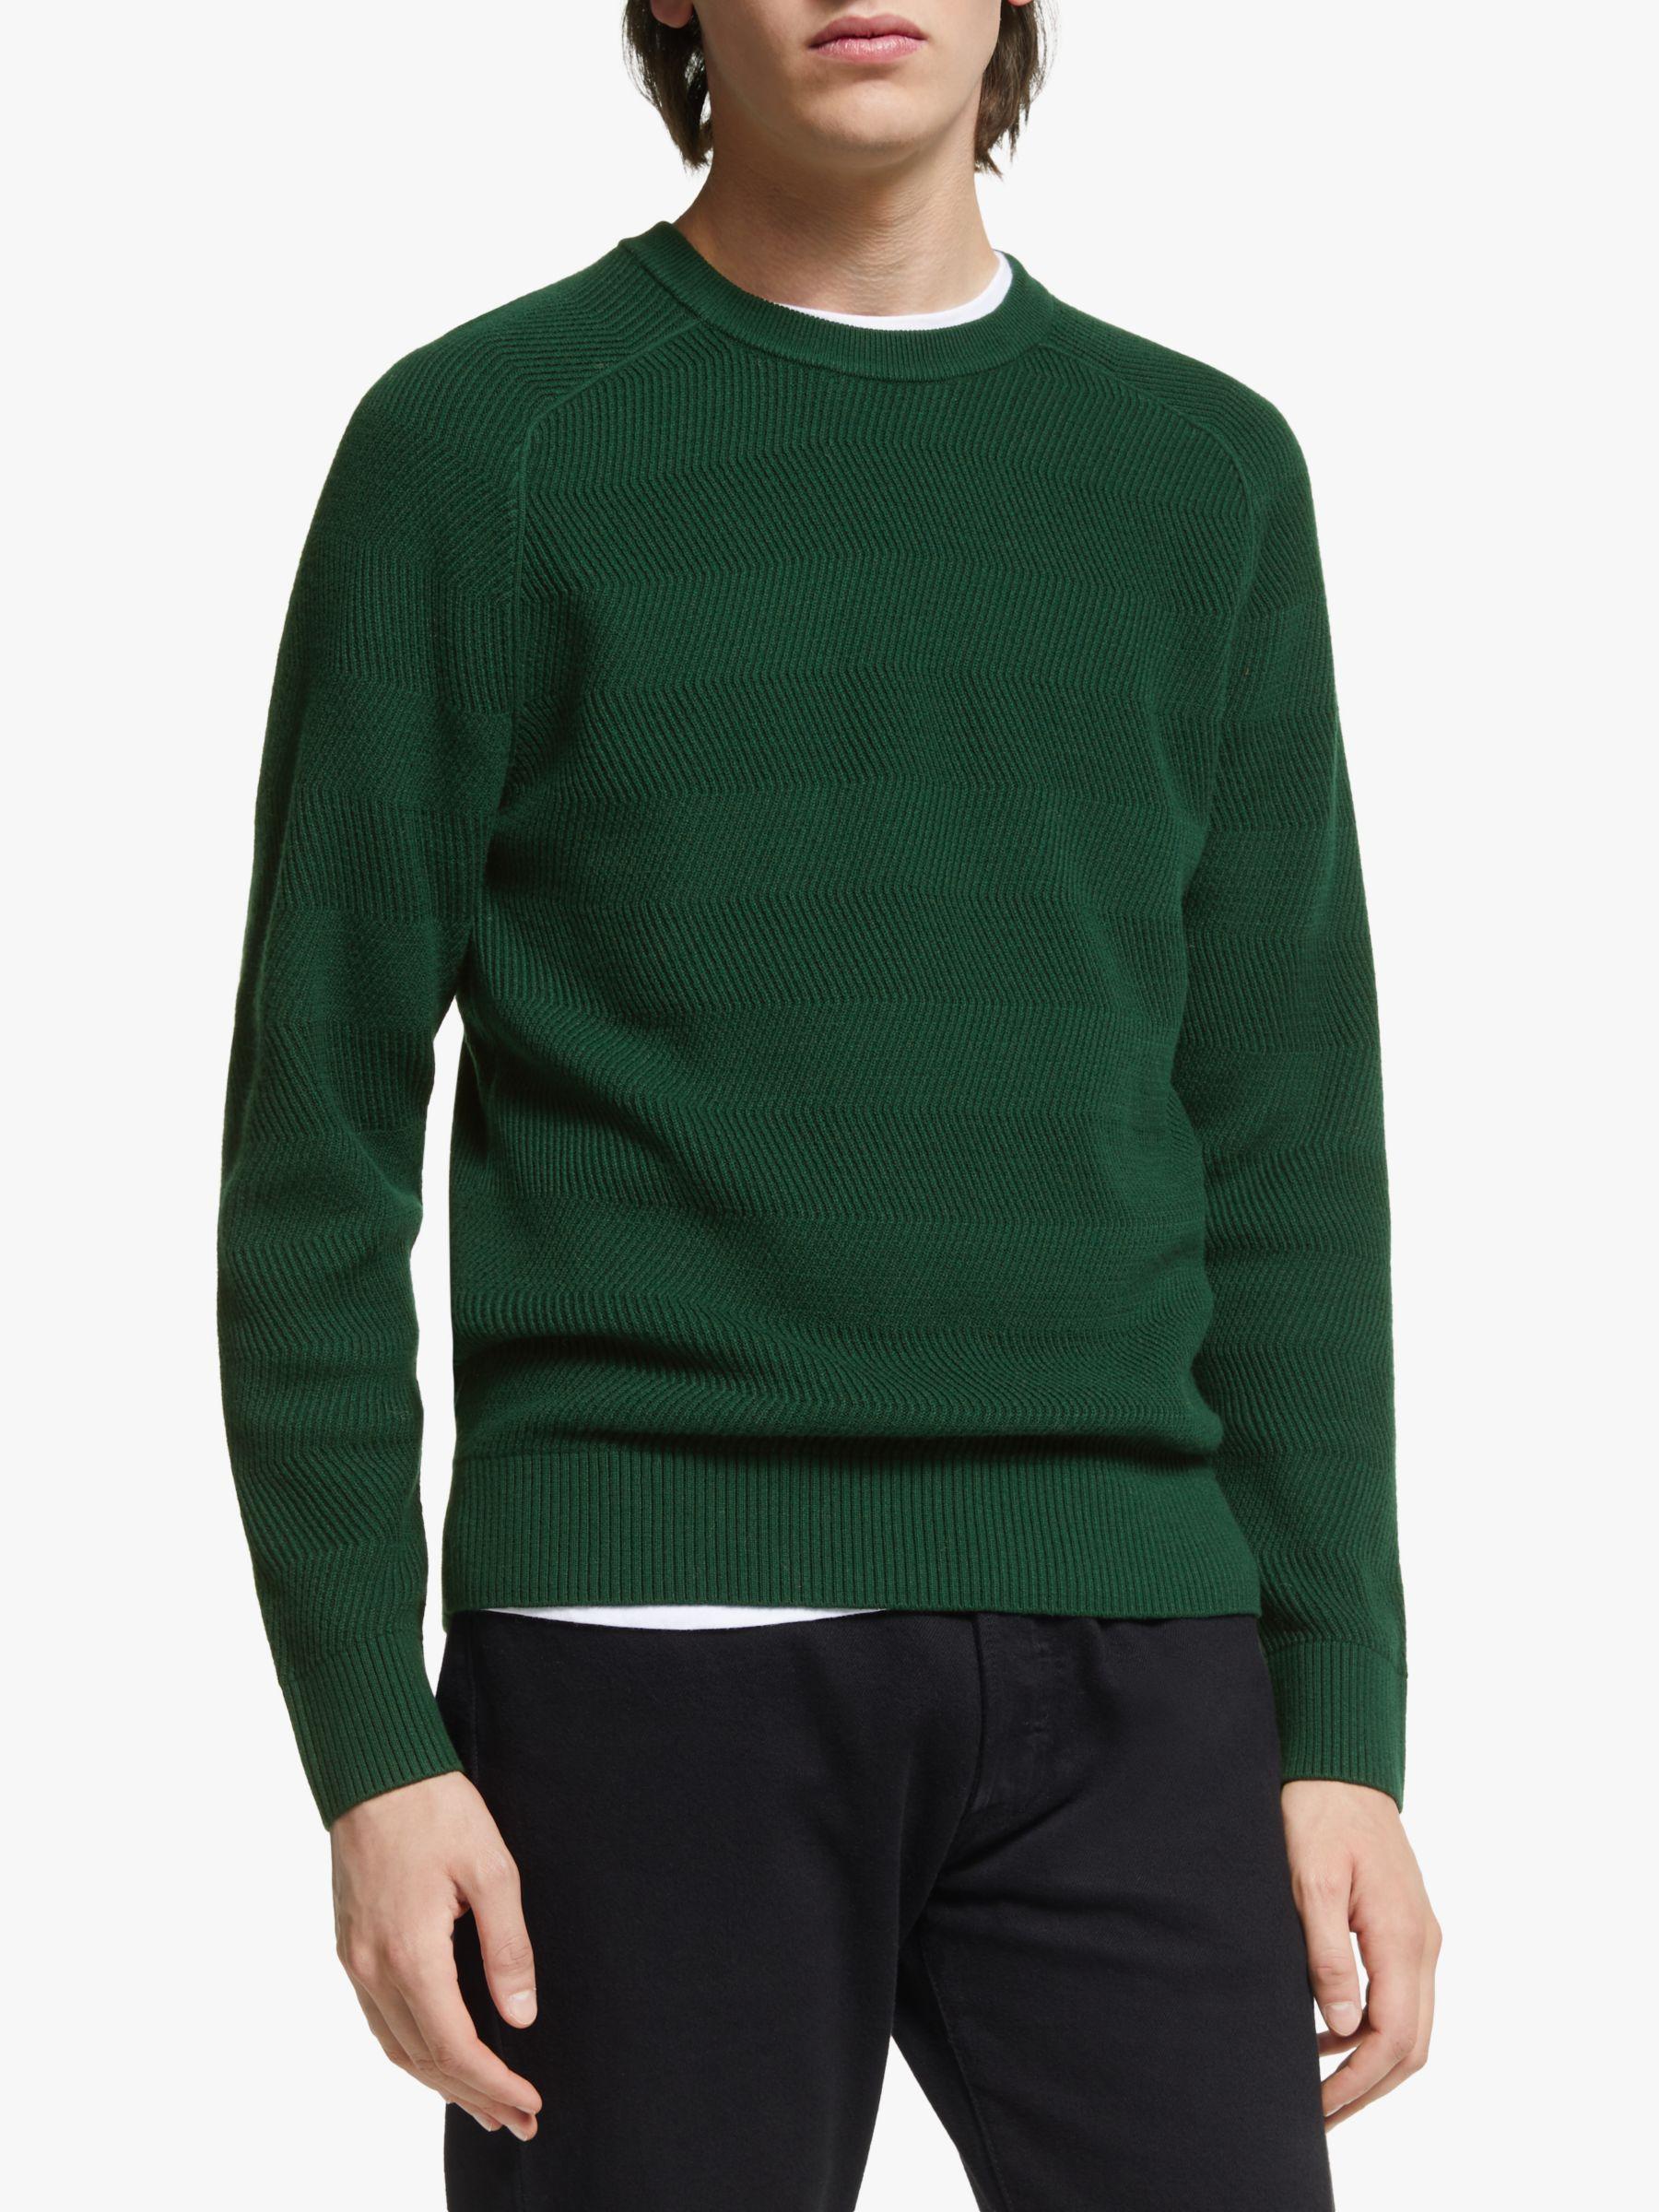 J.LINDEBERG J.Lindeberg Randers Wool Cotton Sweater, Green Fountain